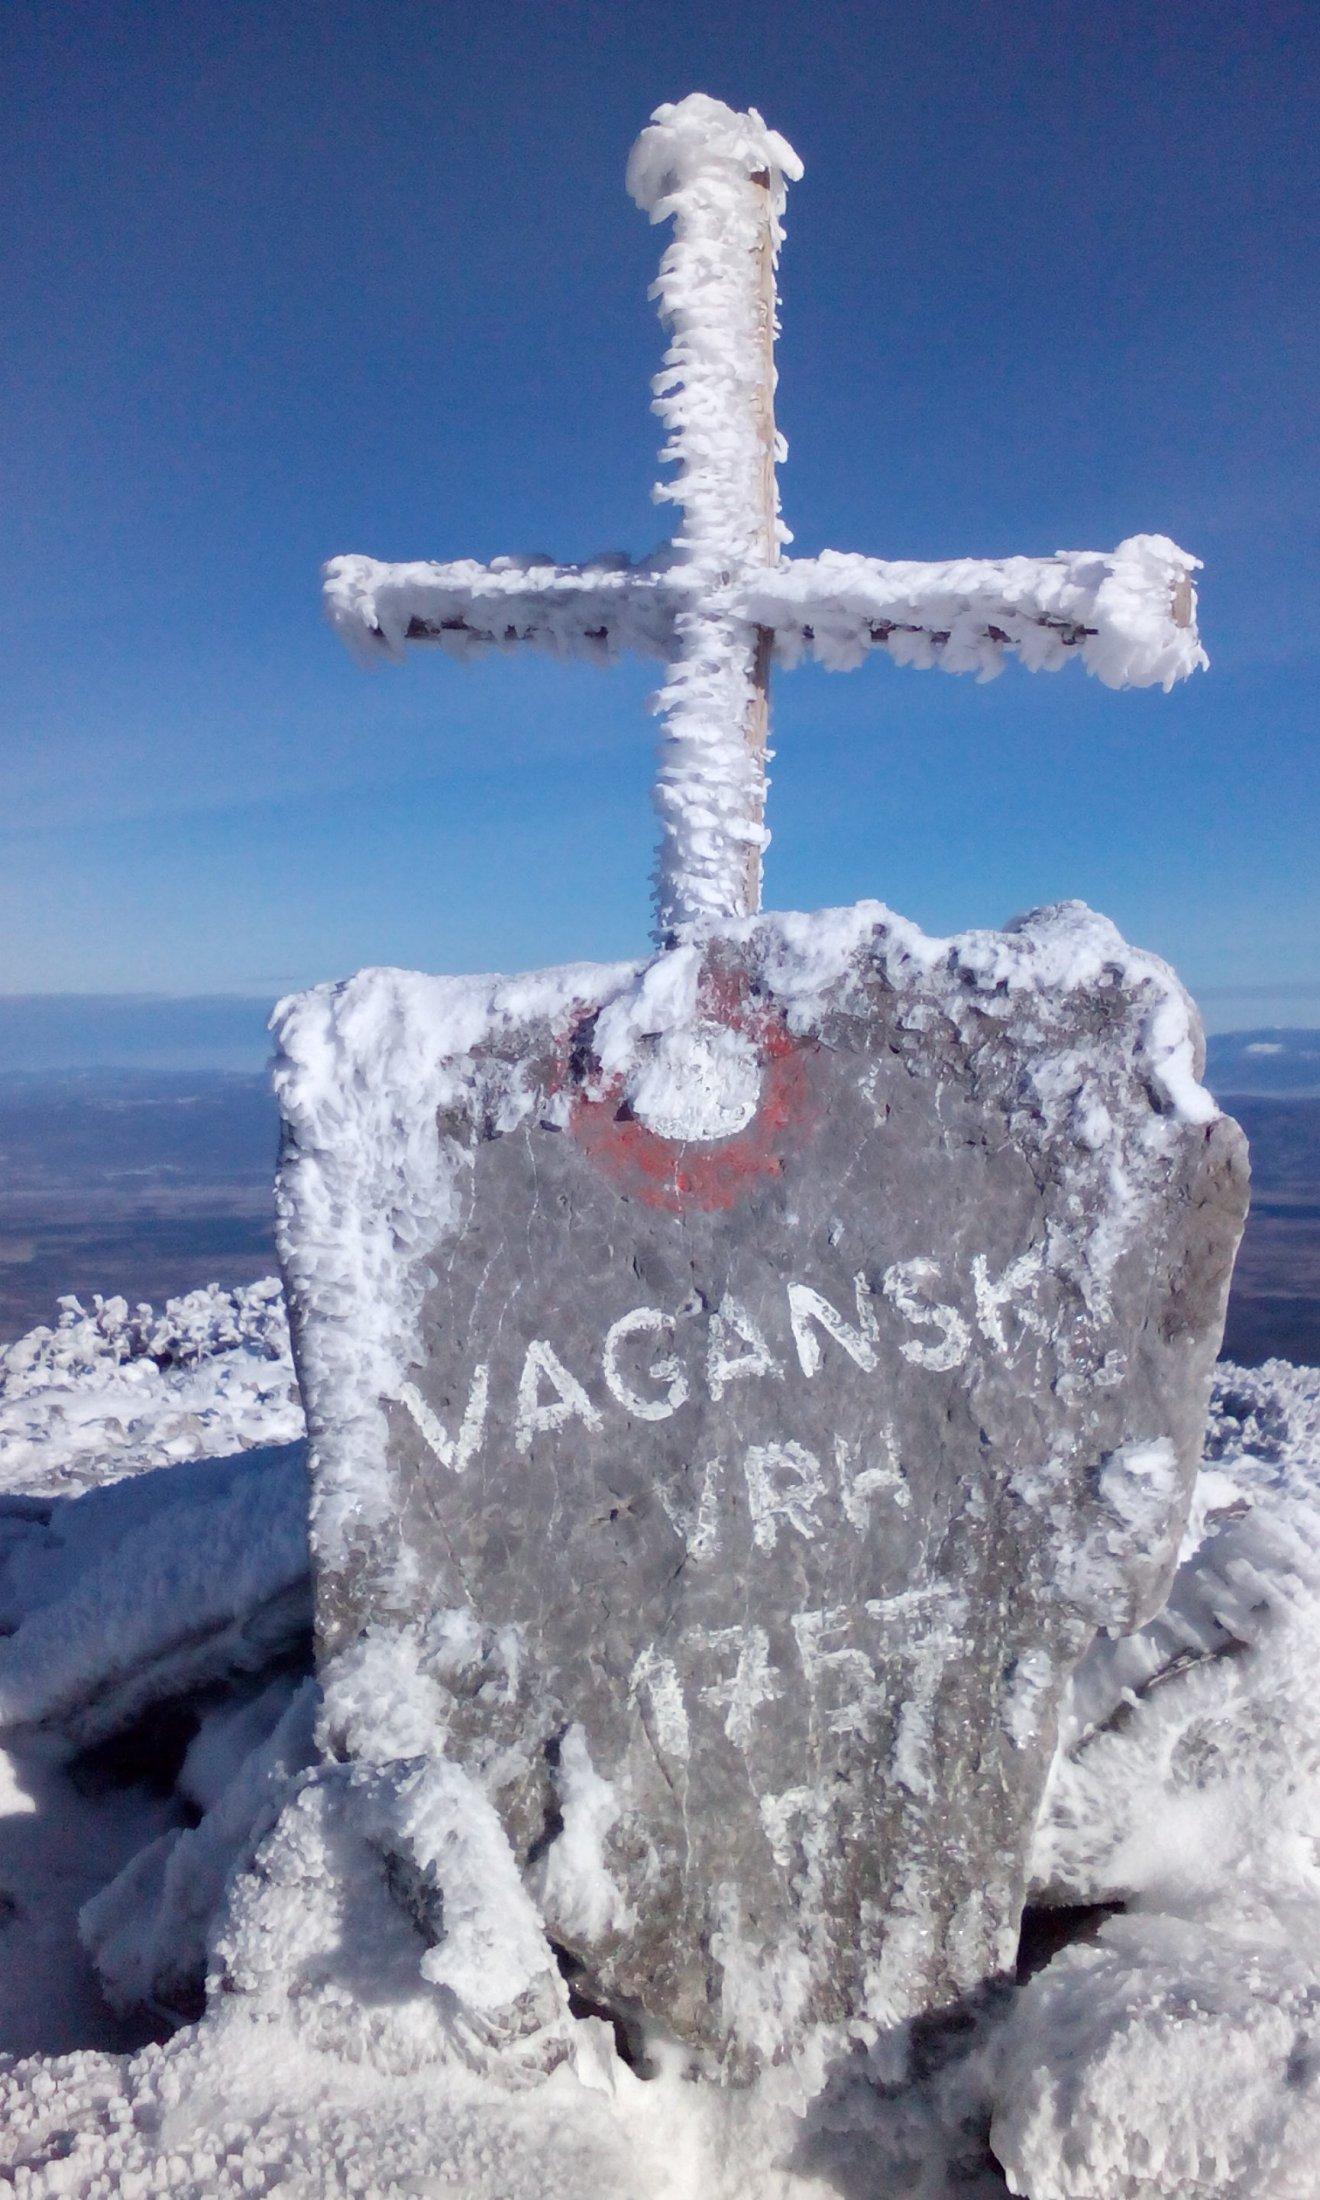 Vaganski Vrh